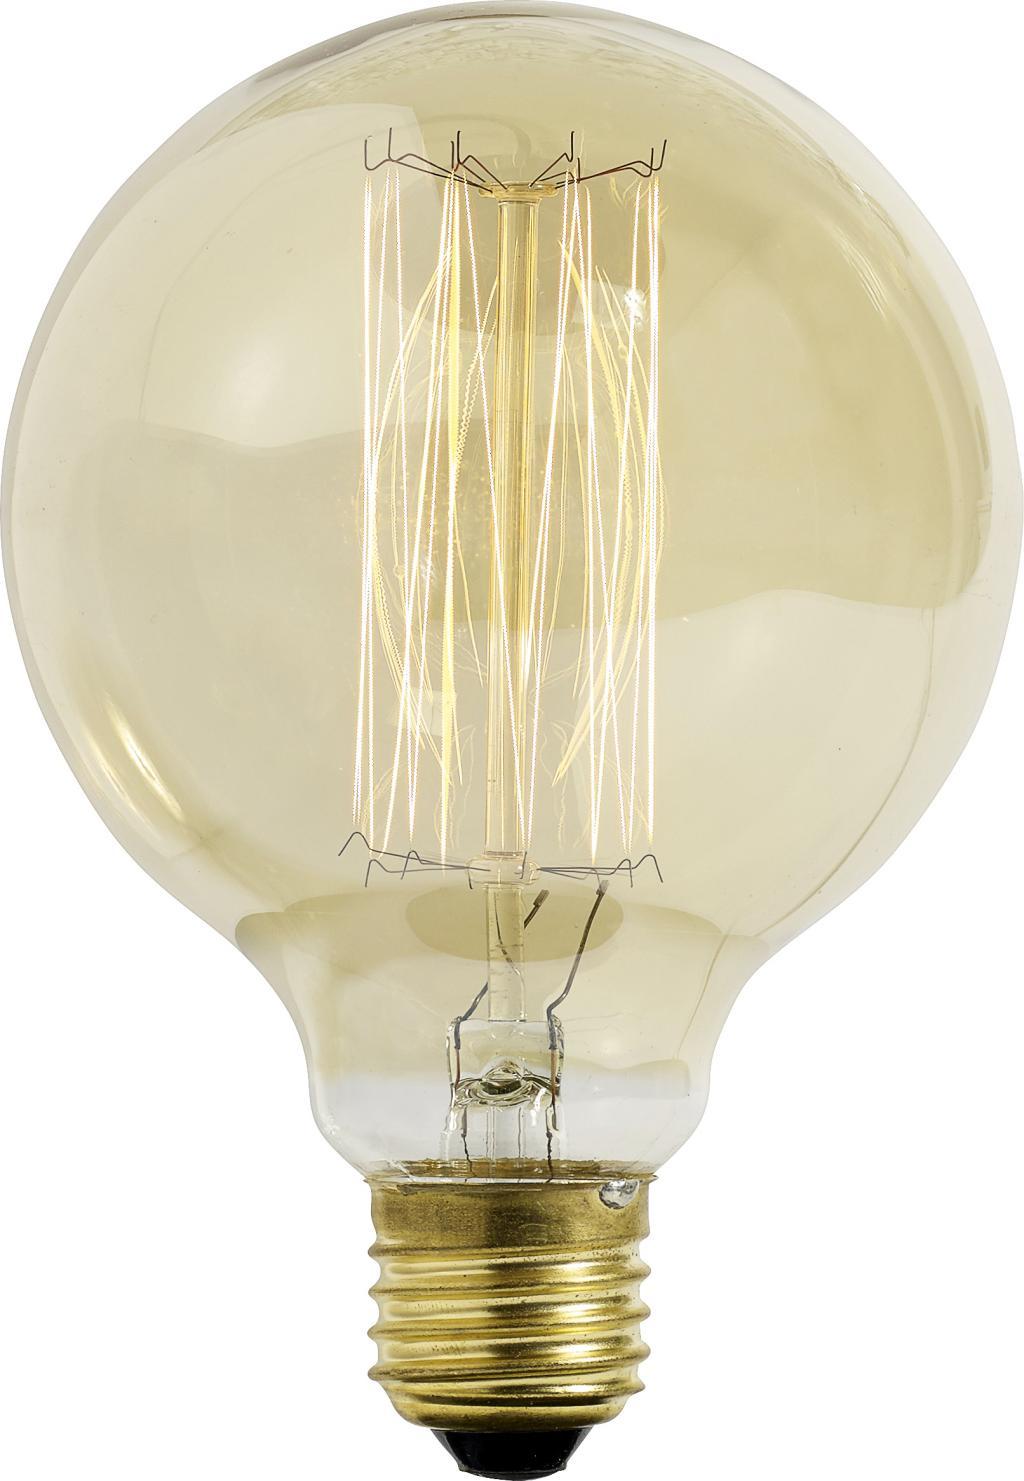 25 30 Https Bing Saves Form Hdrsav: Nordal Lichtbron Vintage 12cm Transparant